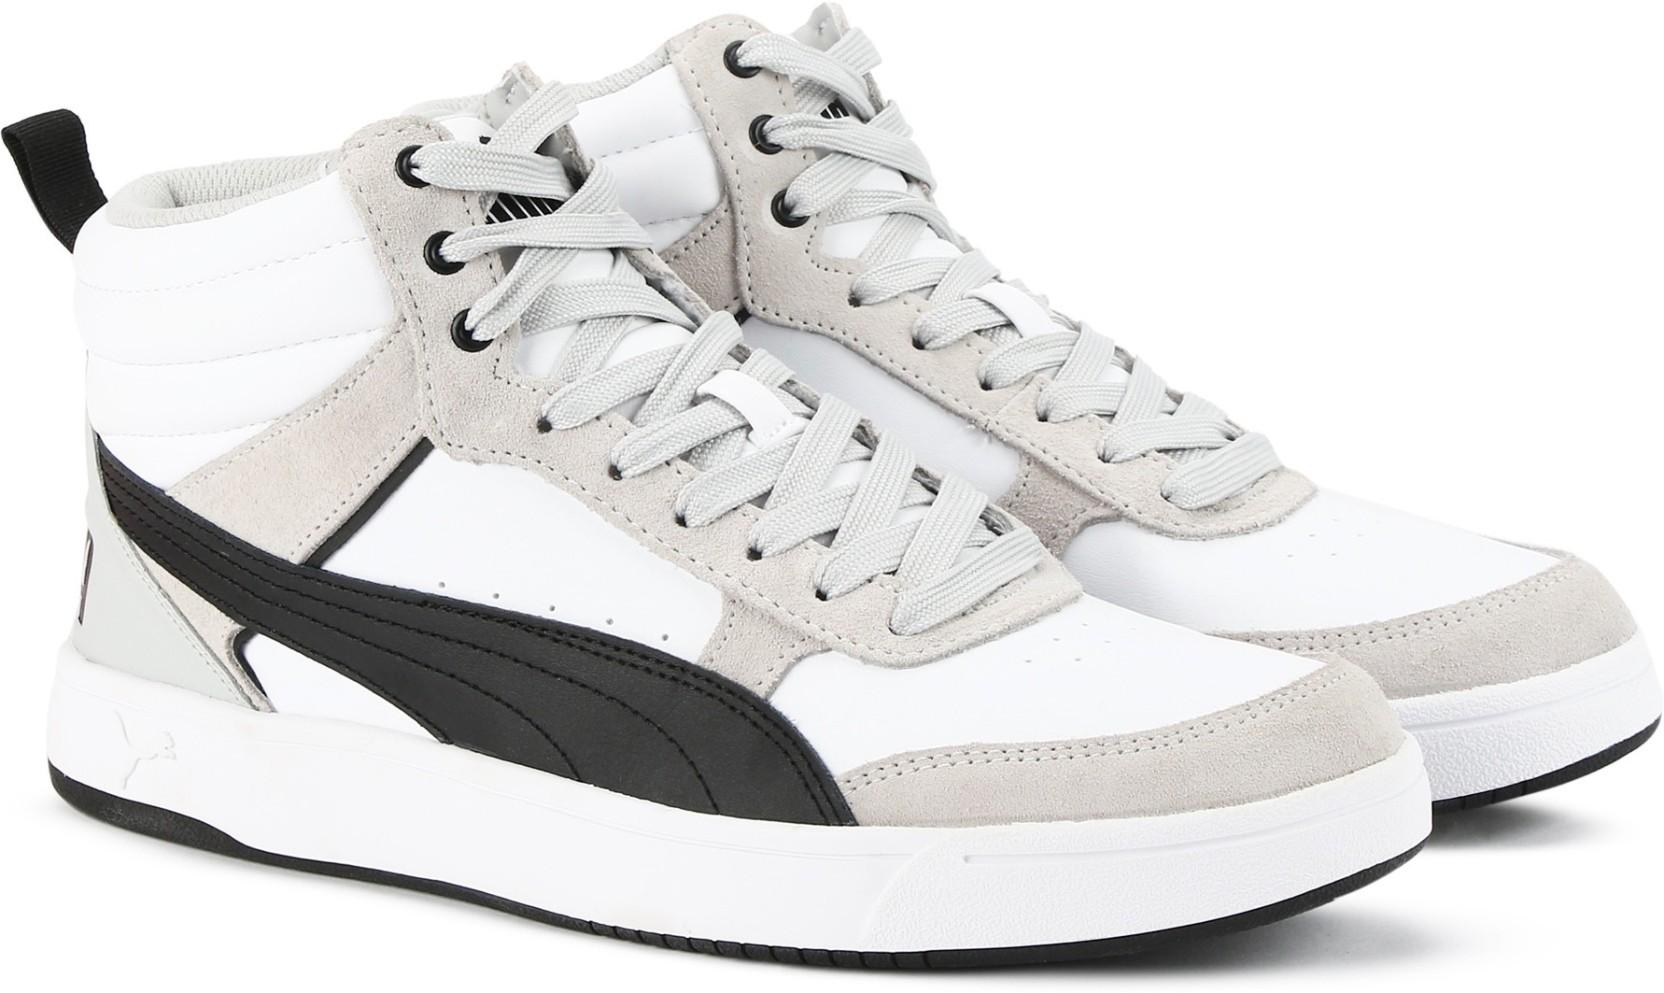 0d5b8d9c2c1 Puma Rebound Street v2 Sneakers For Men - Buy Puma White-Puma Black ...